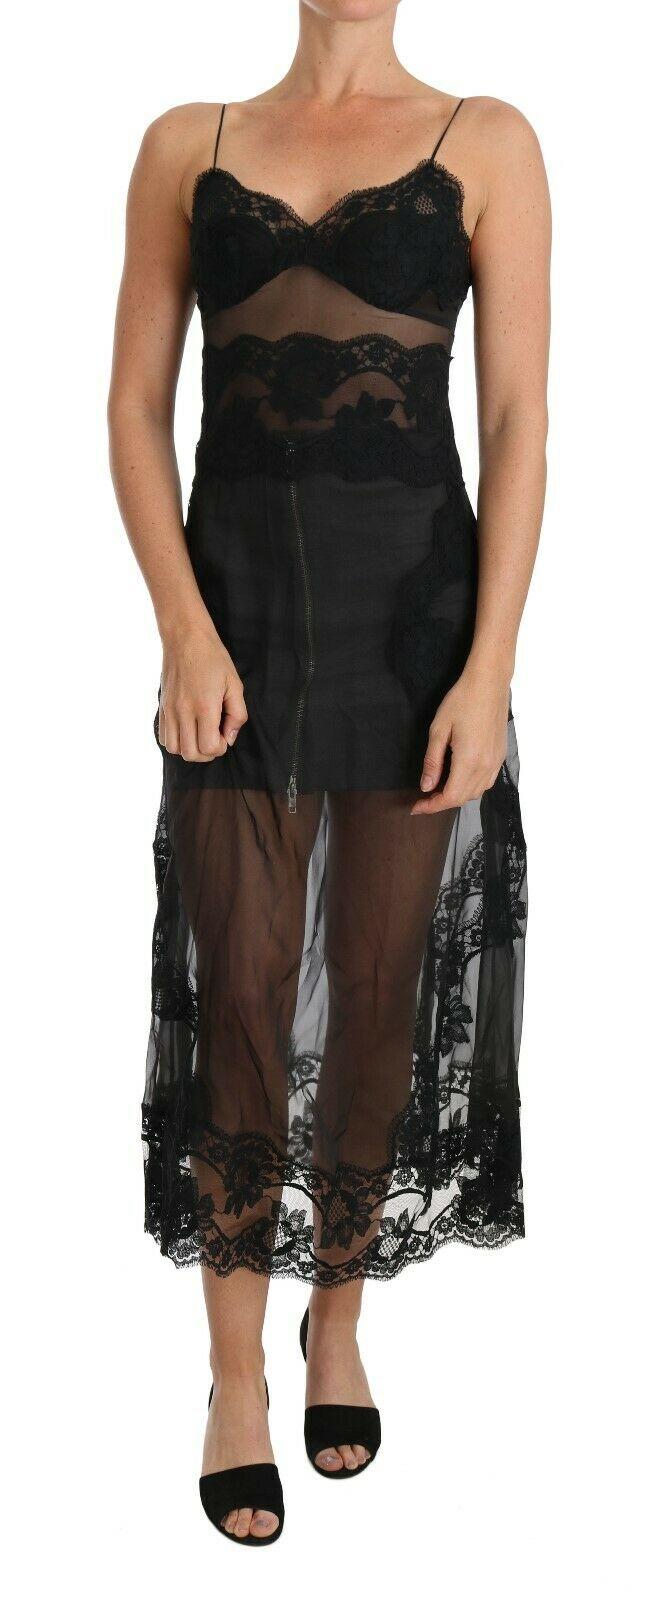 Dolce & Gabbana Women's Silk Lace Chemise Dress Black BIK100 - IT1   XS